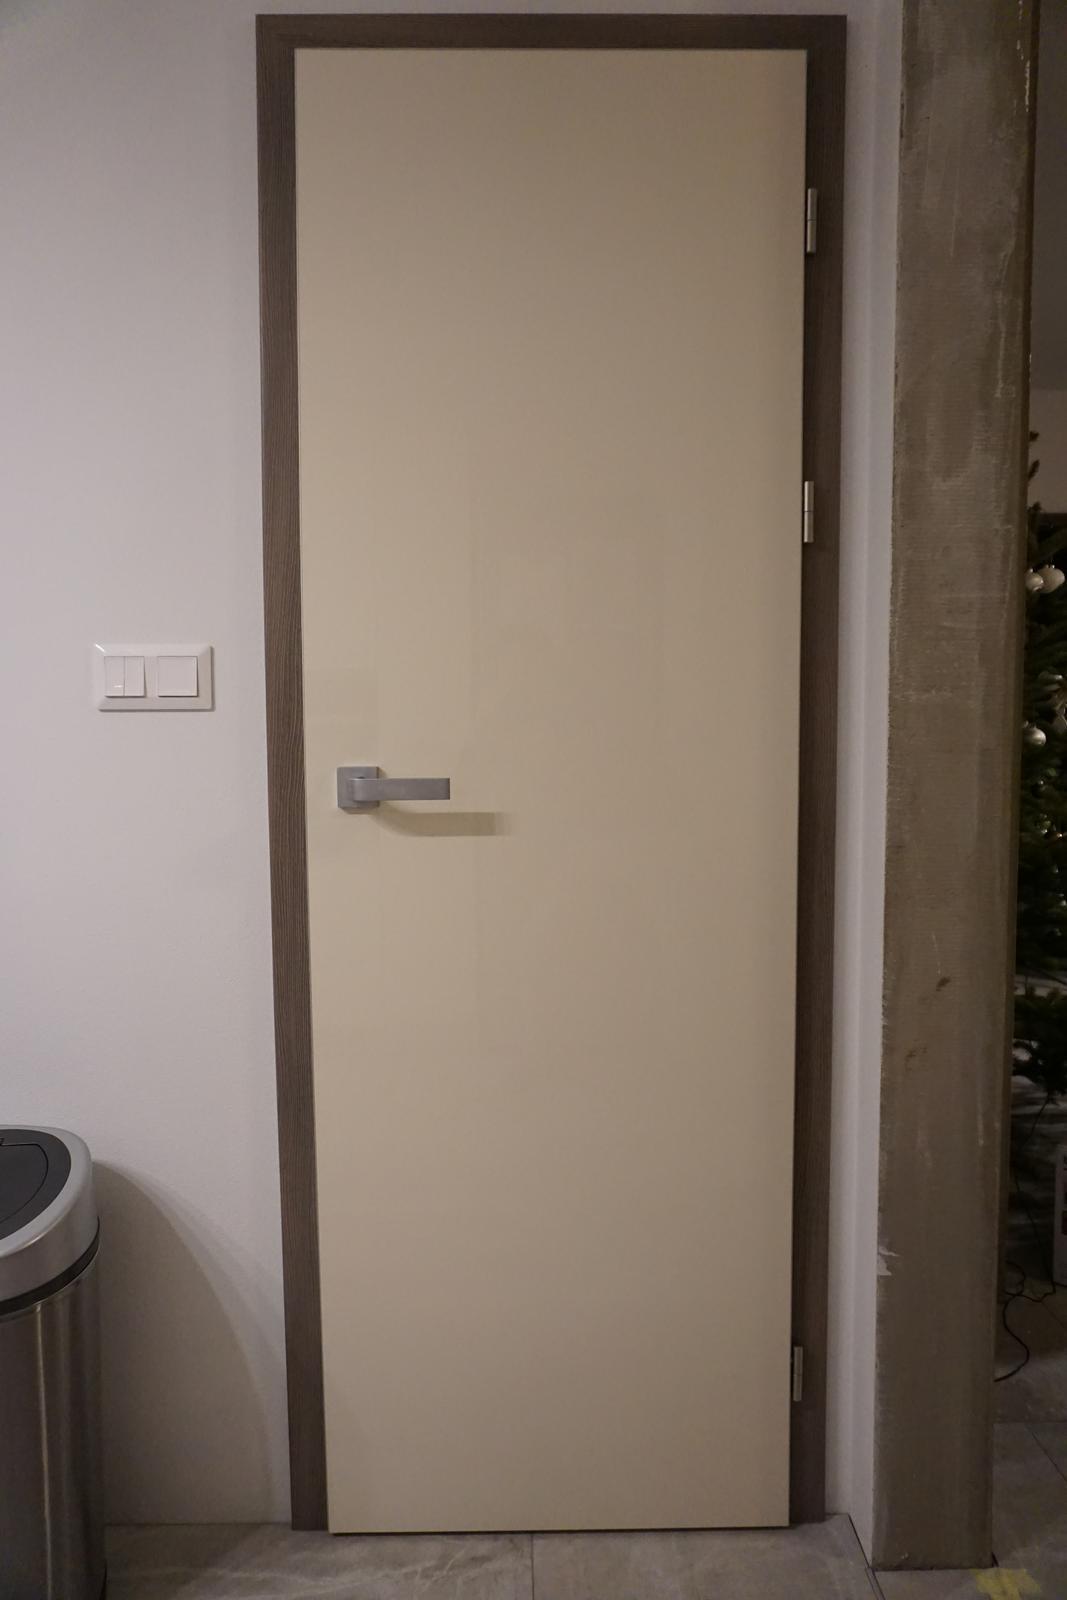 Dvere ku kuchyni - SAPELI Elegant, vysoký lesk vanilka + Sapdecor oliva sivá - Obrázok č. 1